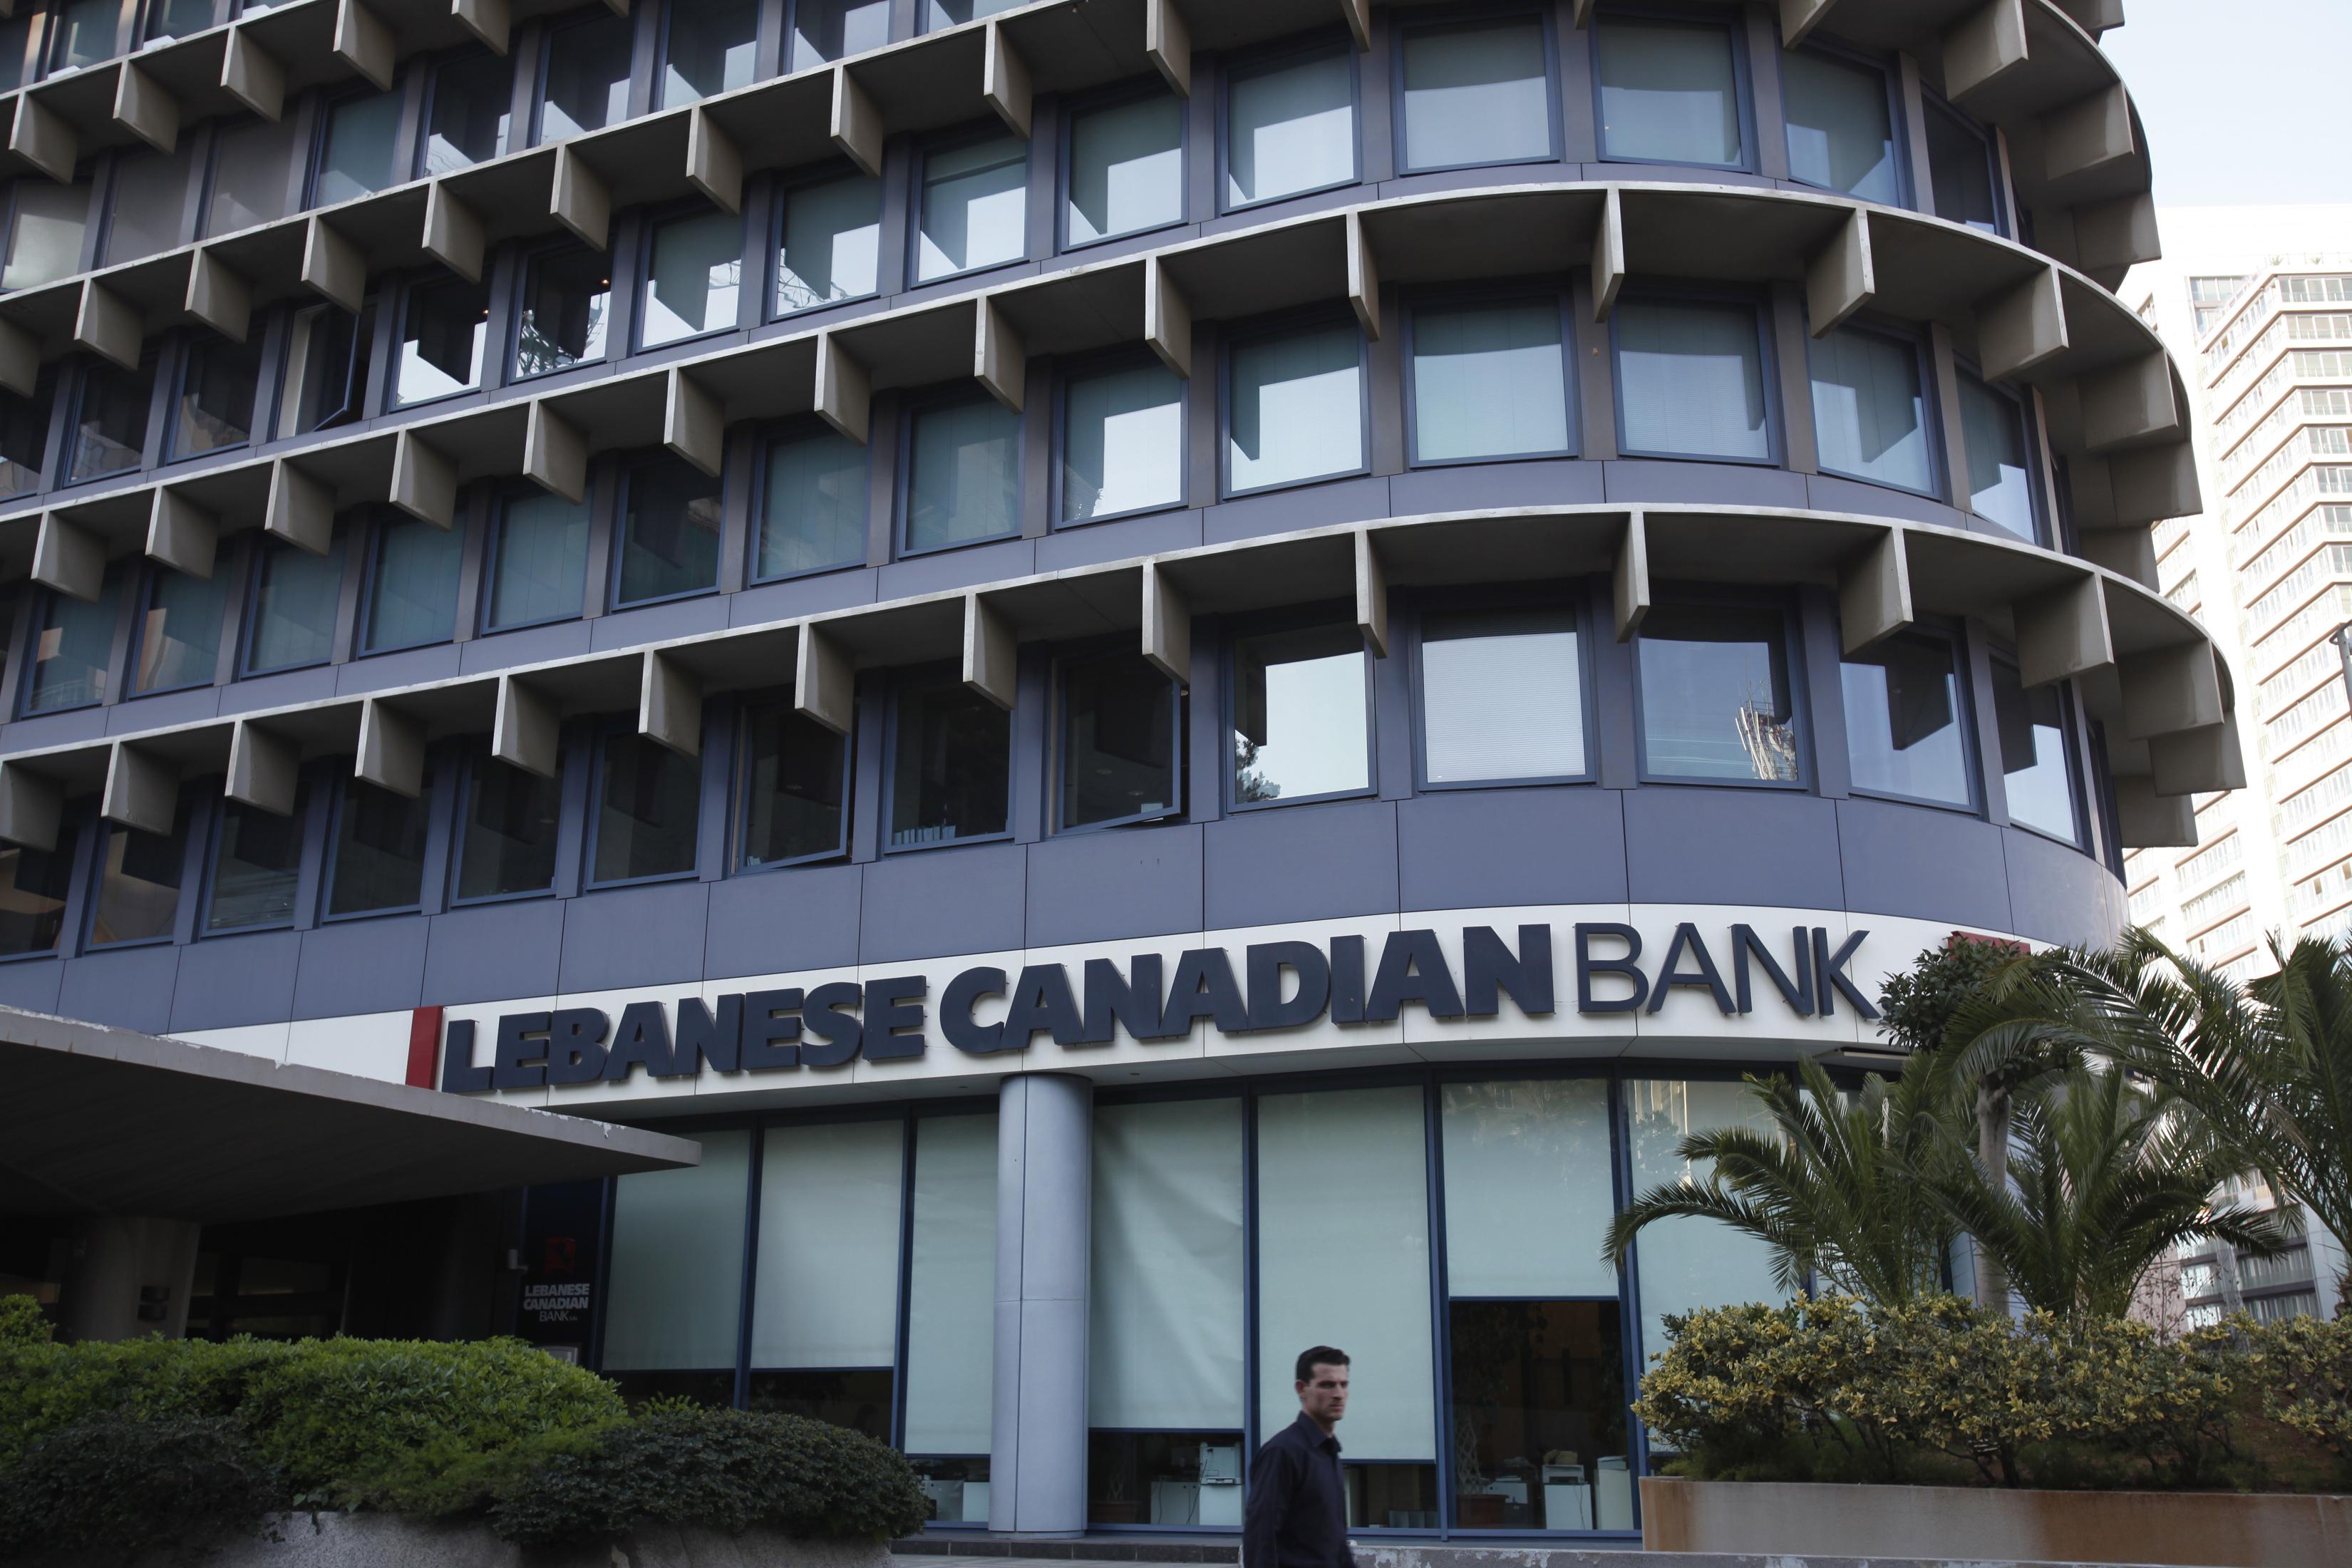 The Lebanese Canadian Bank (LCB) headquarters in Beirut. REUTERS/ Cynthia karam